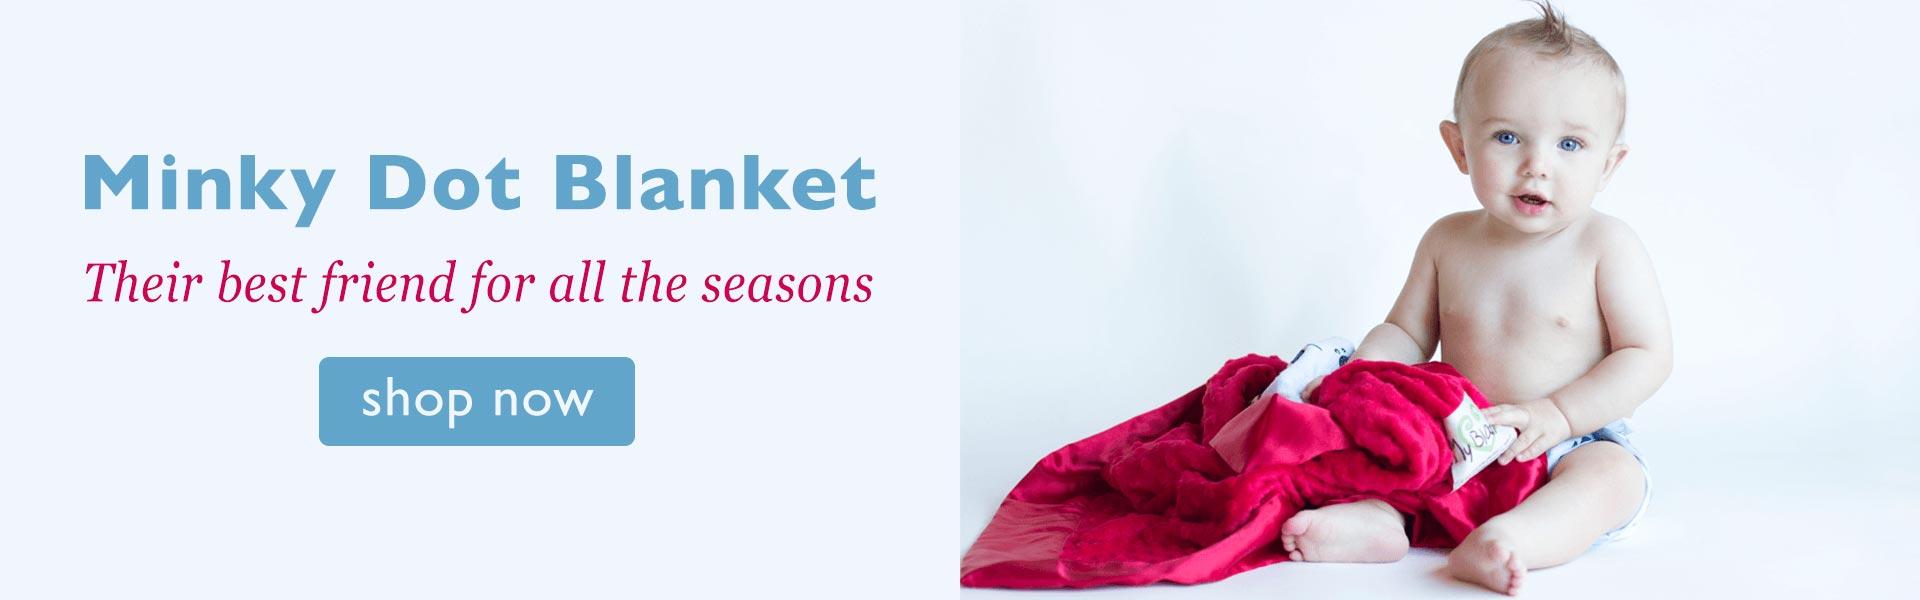 Minky Dot Blanket - Their best friend for all the seasons